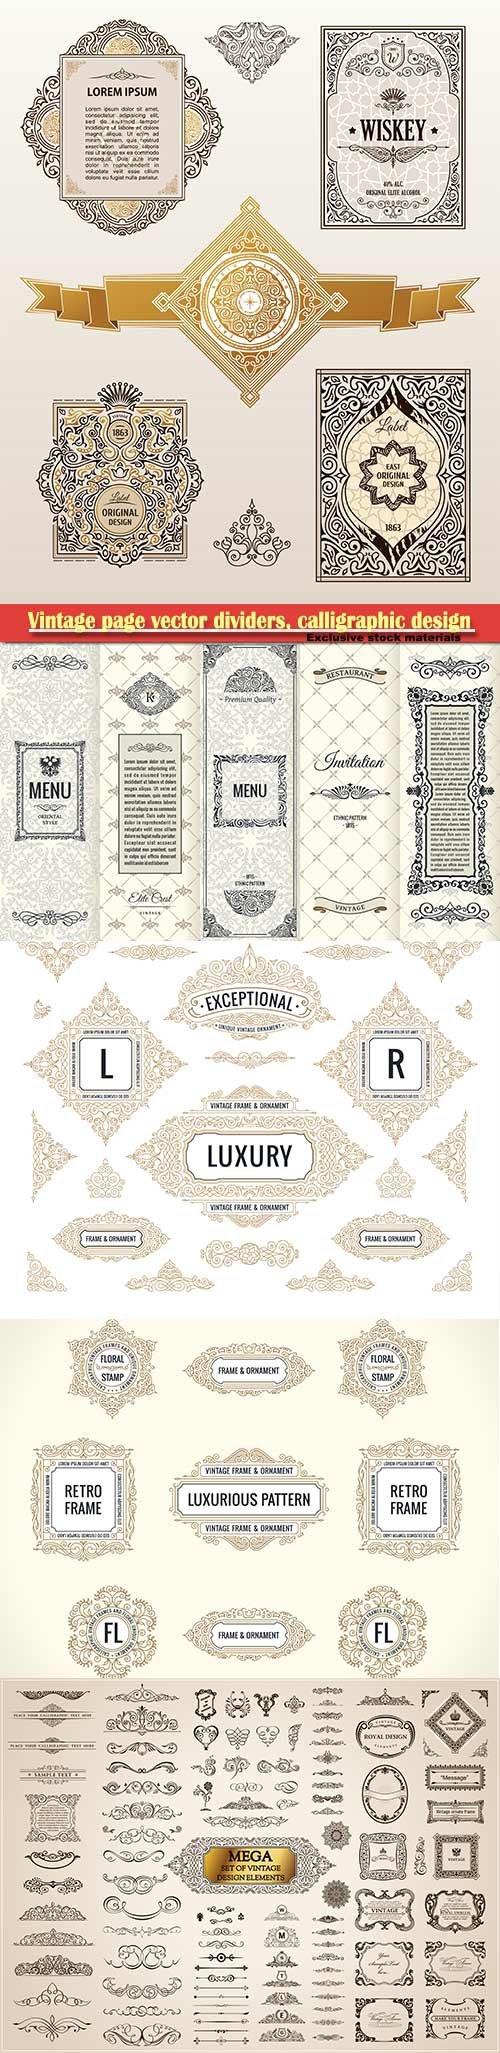 Vintage page vector dividers, calligraphic design logo set